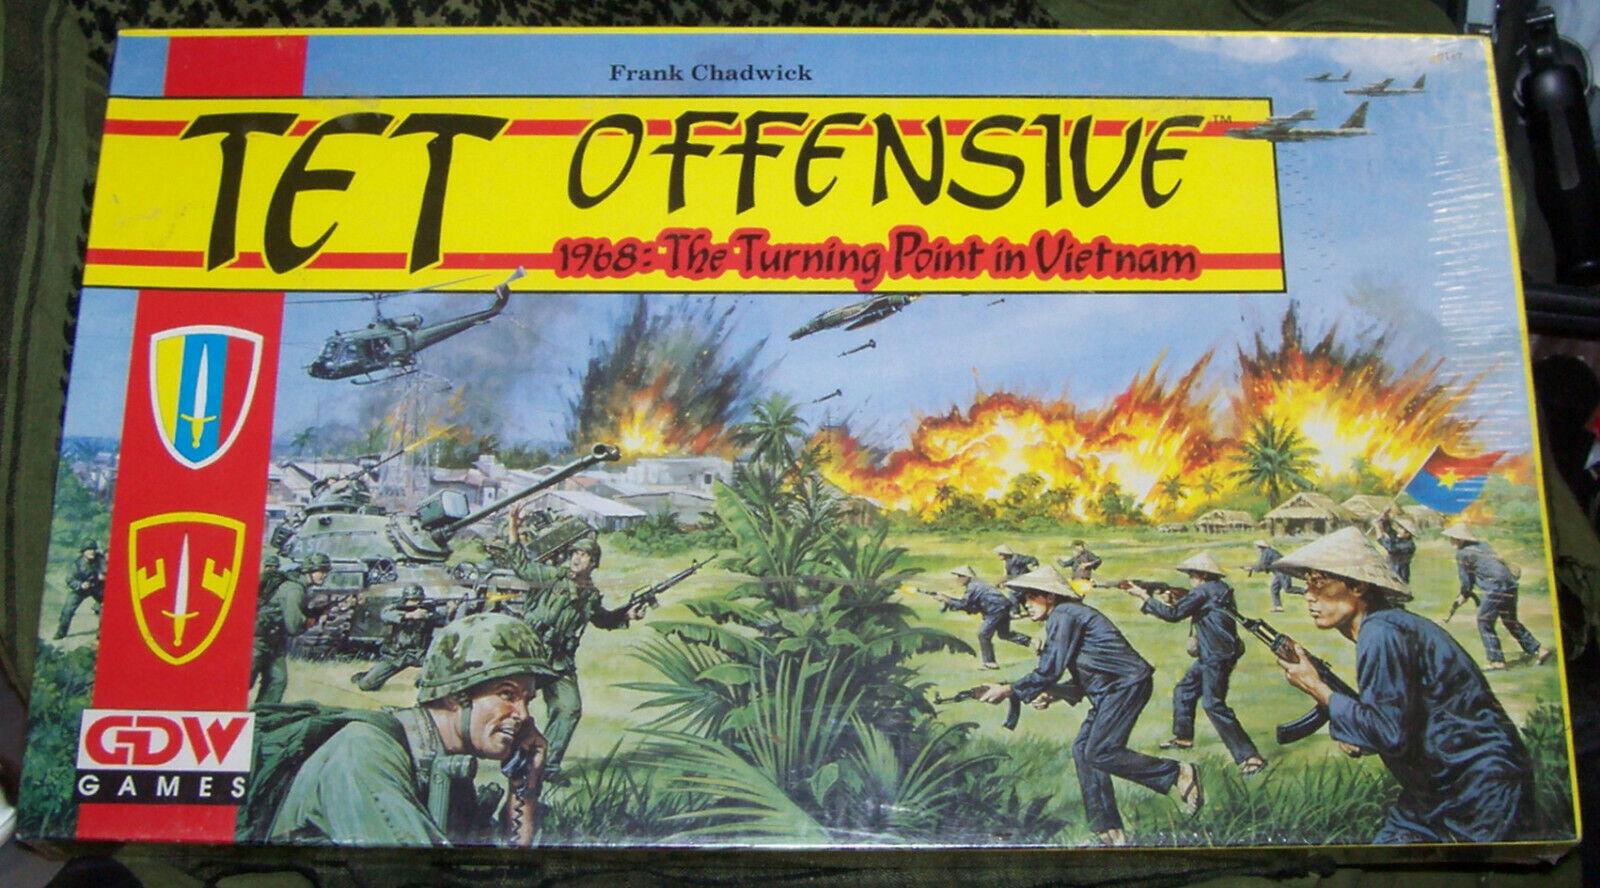 Tet Offensive 1968 Turning Point in Vietnam GDW Games 1991 encore en shrink